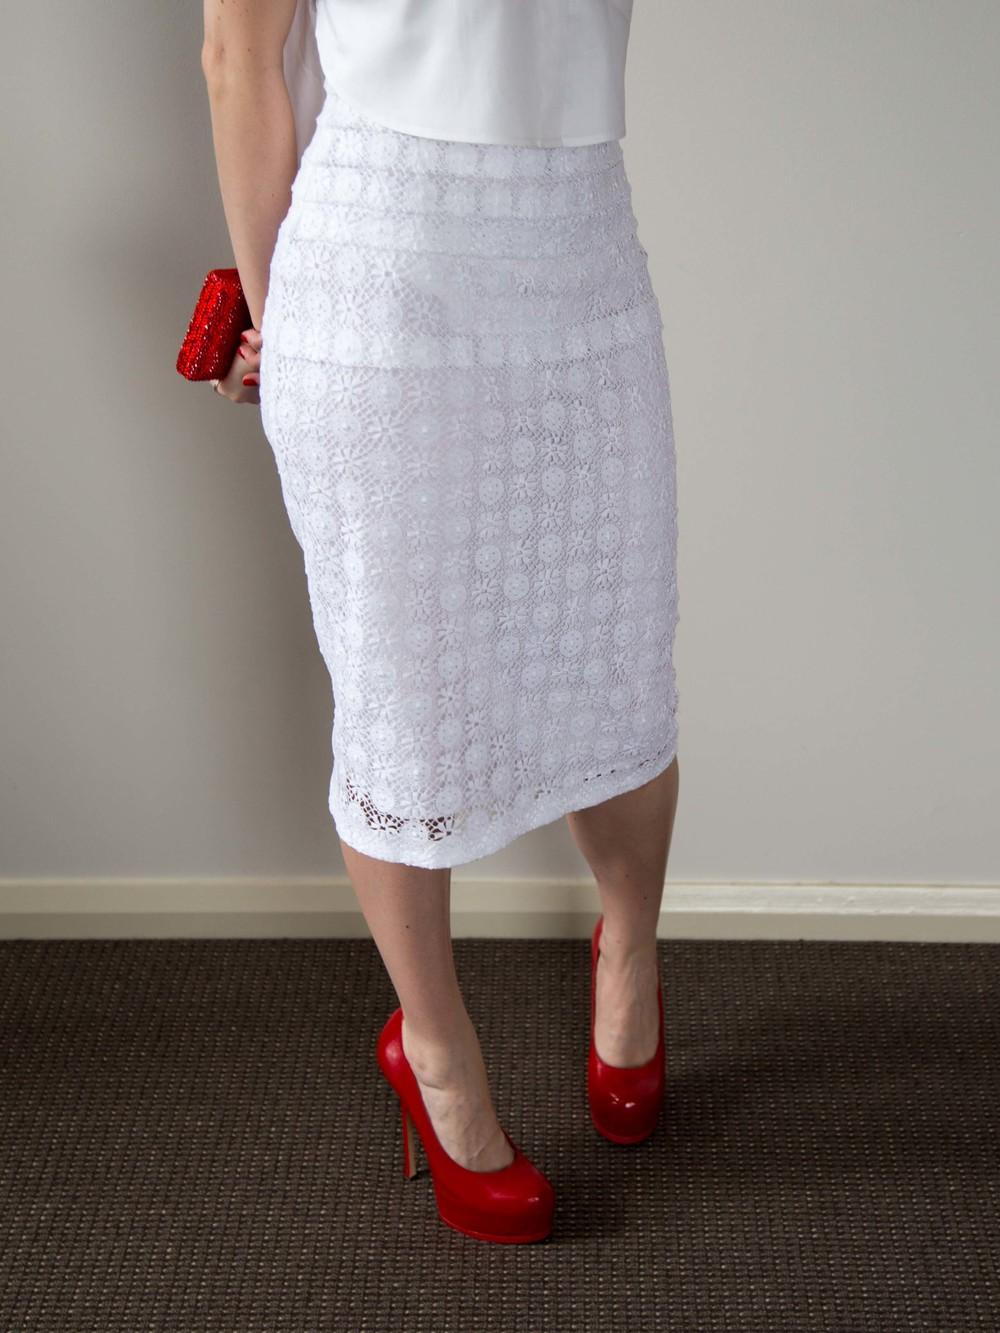 LOVER® White Crop Shirt, Burberry Prorsum English Lace V-Neck Dress, Yves Saint Laurent Heels, Swarovski Clutch